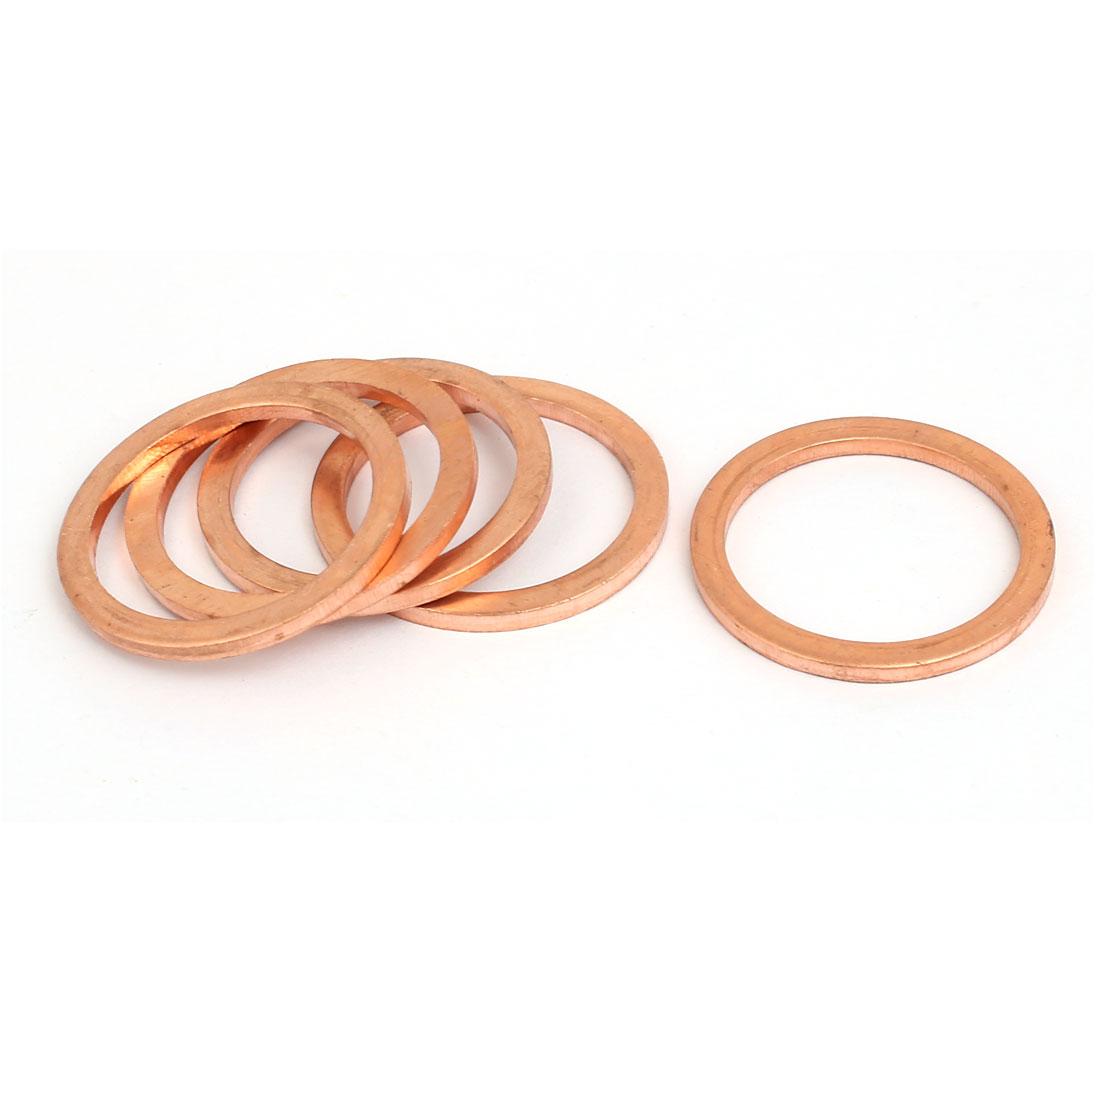 5pcs 24mmx30mmx2mm Copper Flat Ring Sealing Crush Washer Gasket